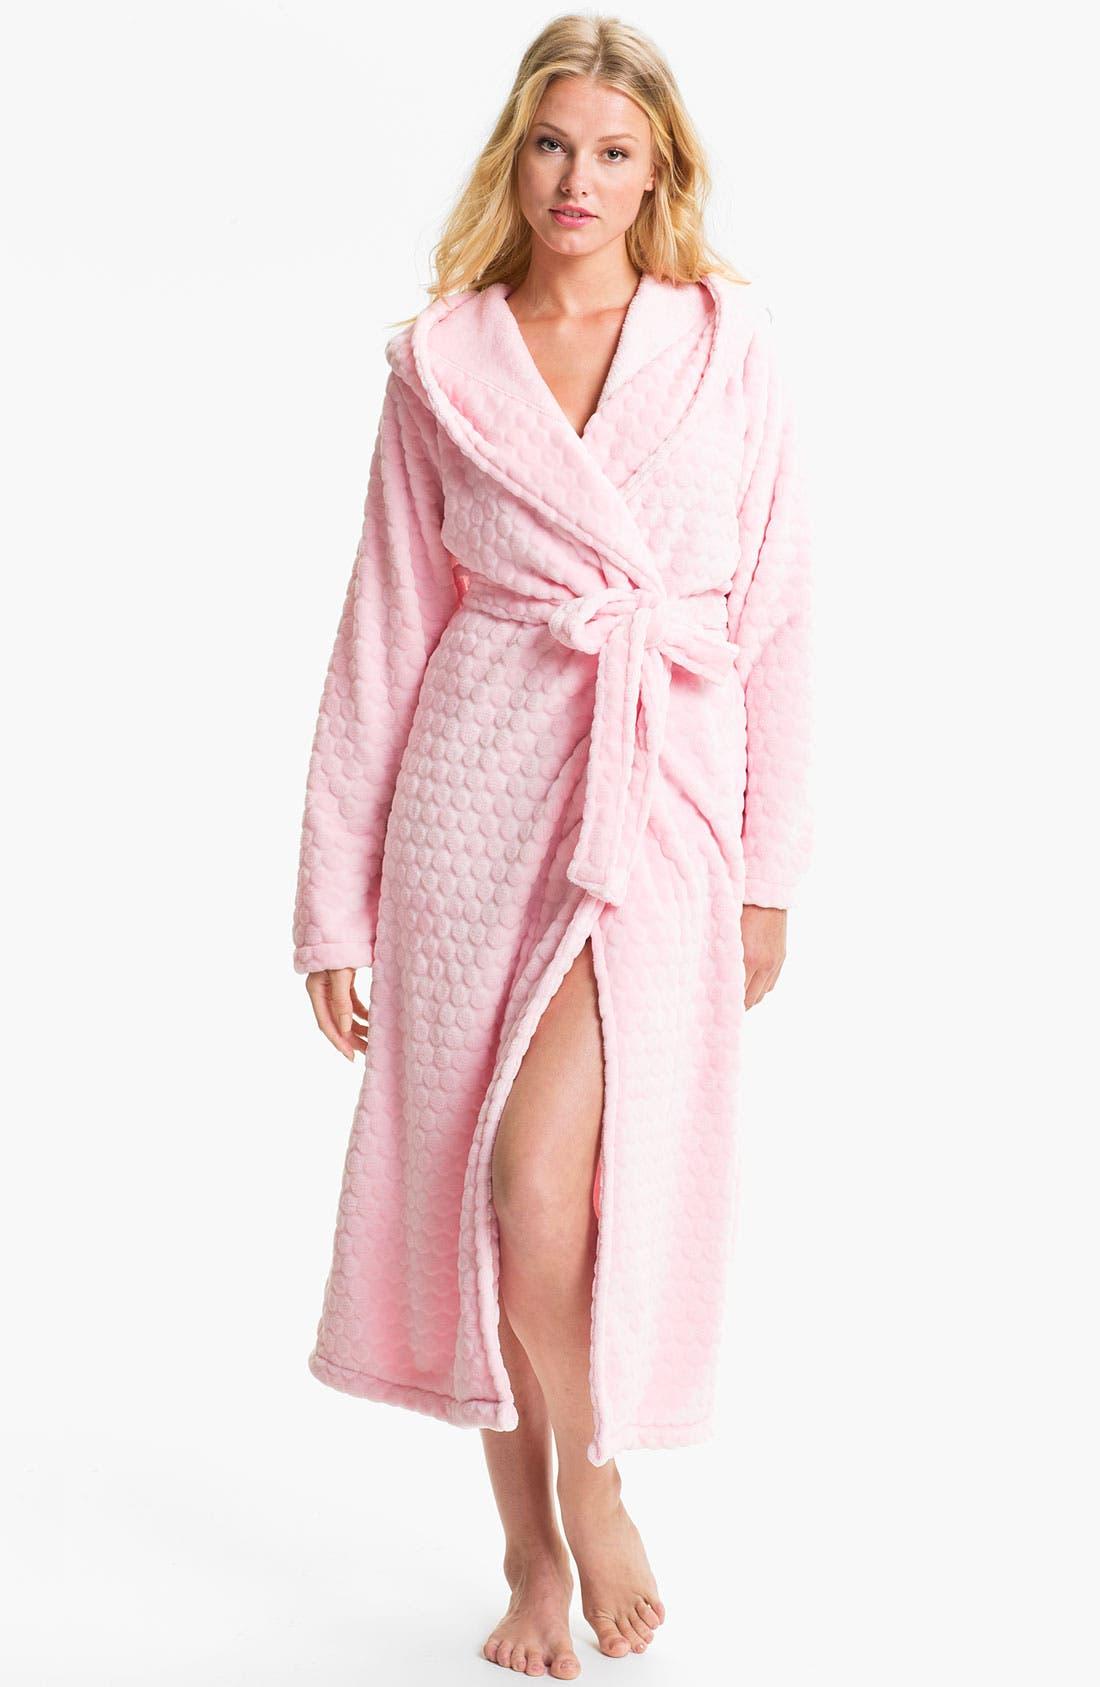 Alternate Image 1 Selected - Nordstrom 'Snowball' Plush Robe